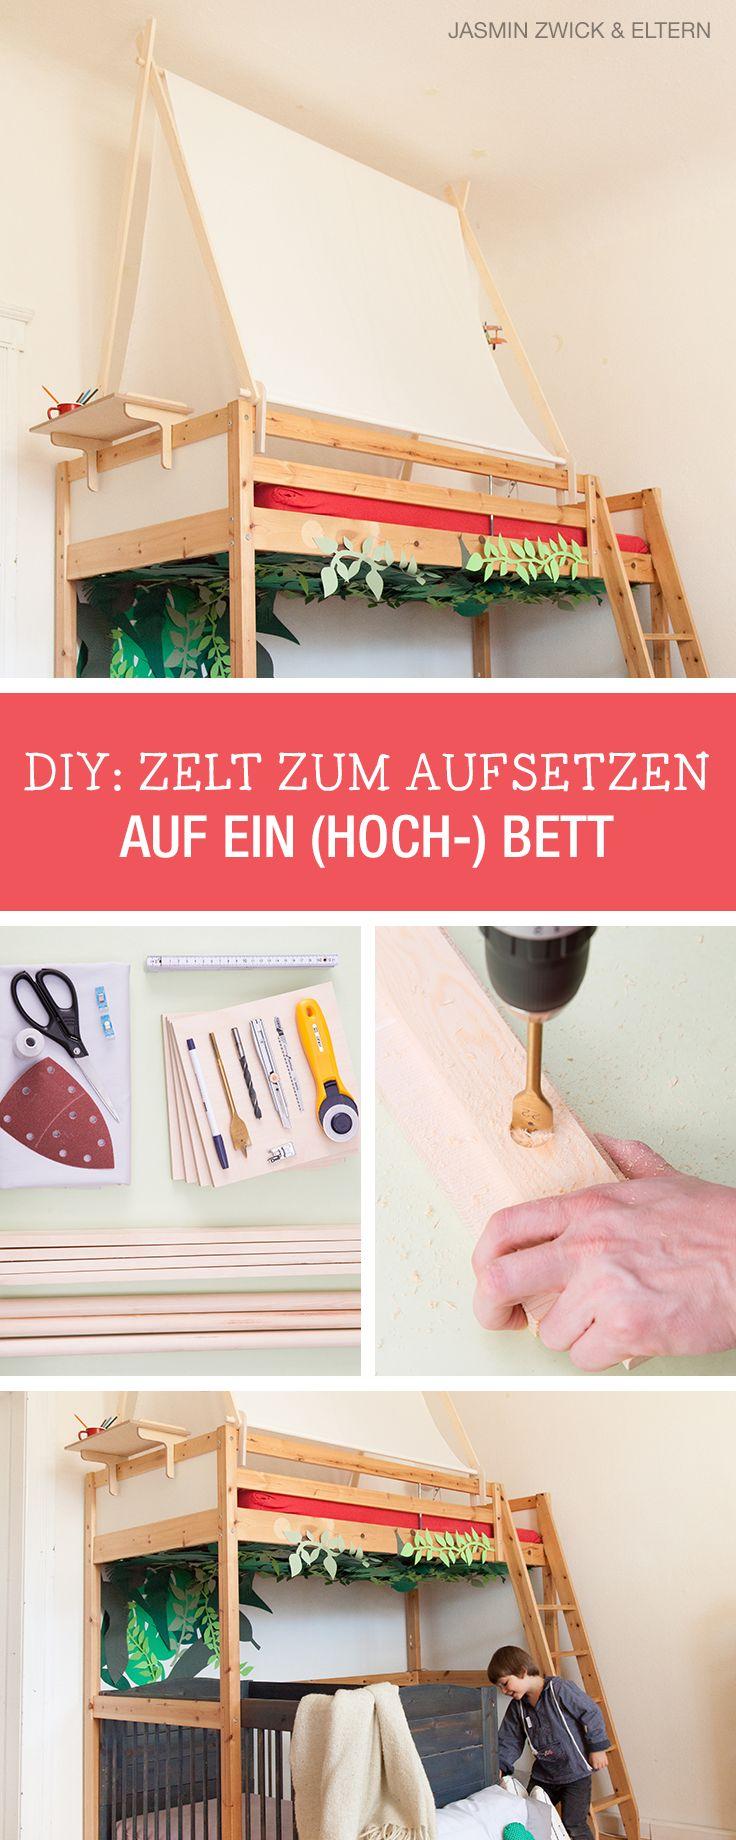 guenstige inspiration modellbahn beleuchtung anleitung große bild der ffcedffadbcfacbede child room diy inspiration